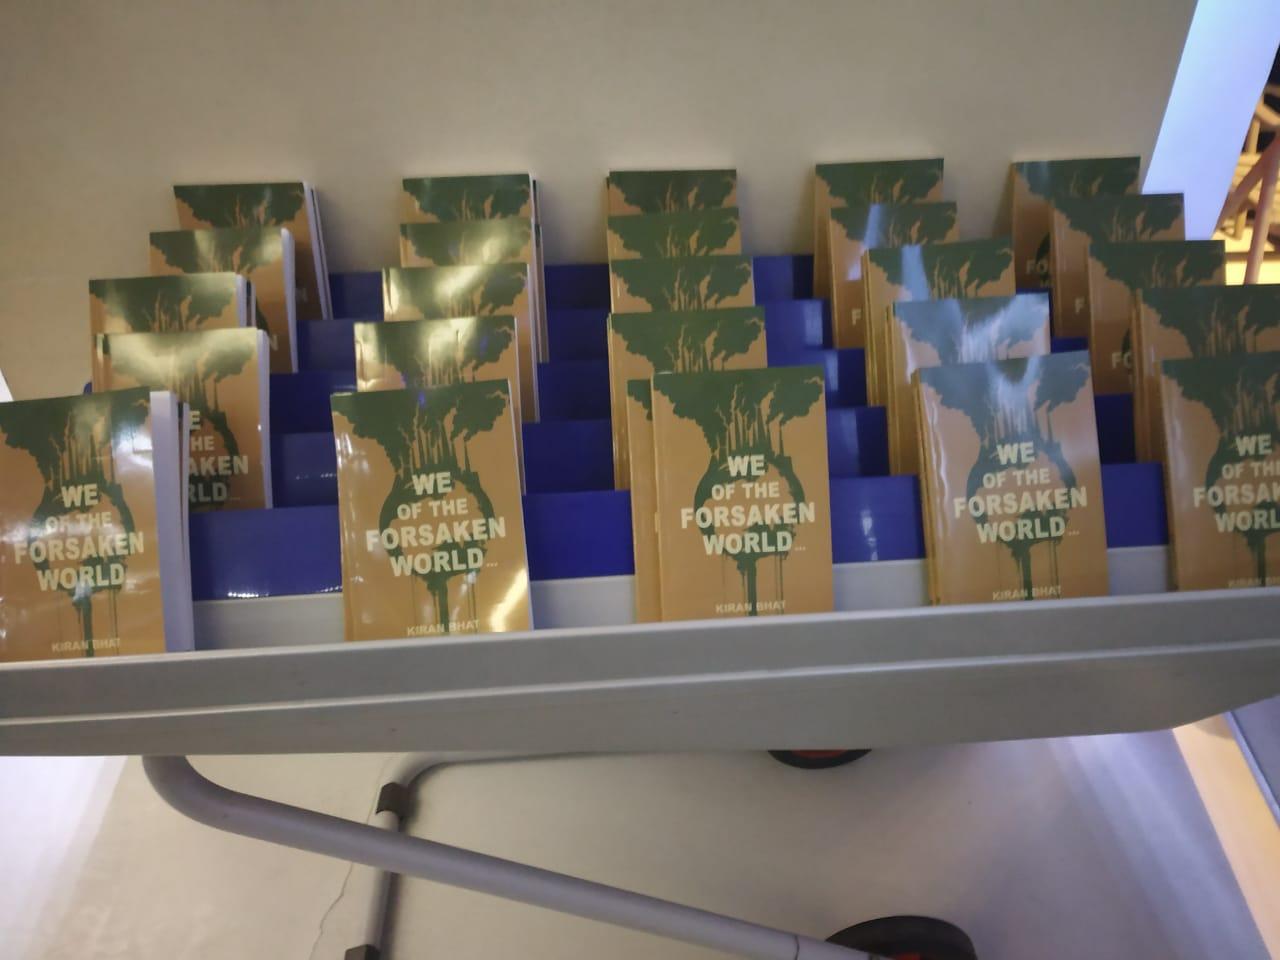 New Launch – We of the Forsaken World – Author Kiran Bhat